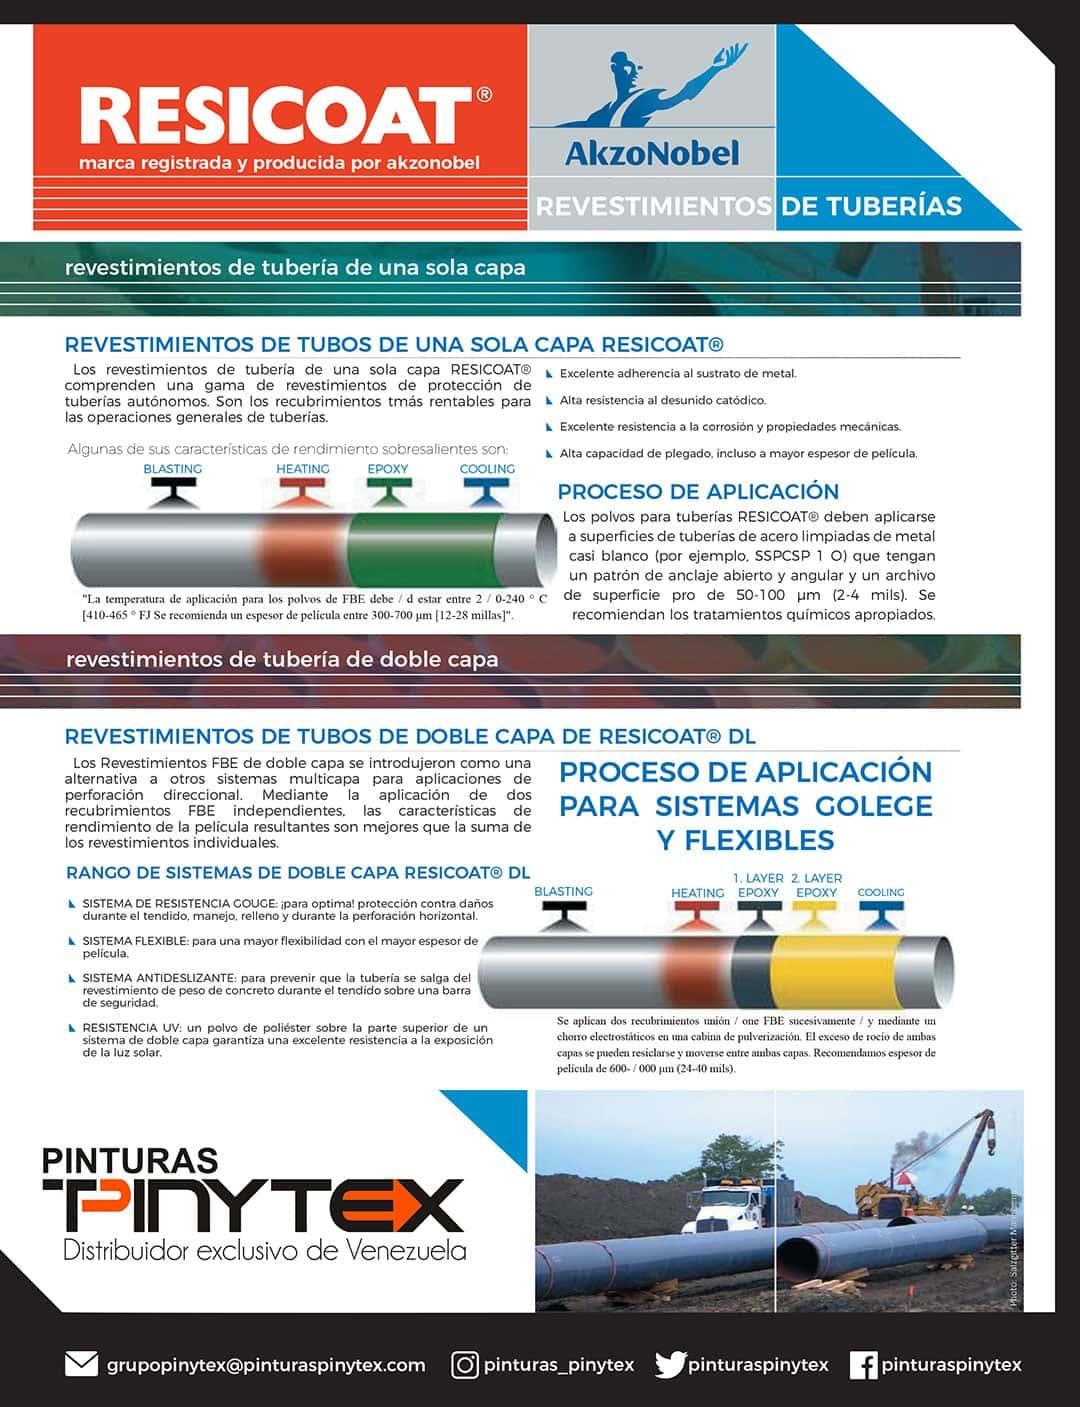 Pinturas Pinytex